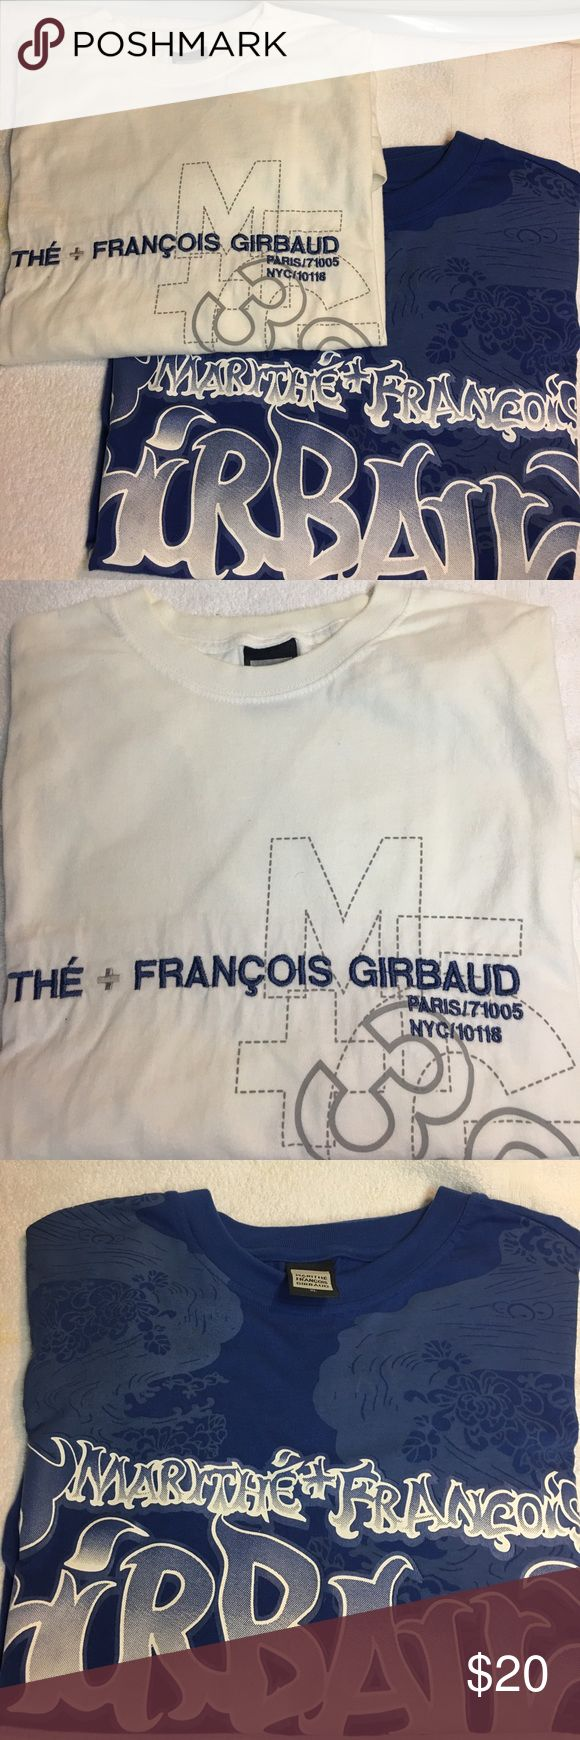 Marithe Francois Girbaud T-shirt Bundle Marithe Francois Girbaud T-shirt Bundle. Blue one is NWOT. White one is GUC. Both size XL. Machine washable. 100% Cotton. Smoke Free Home. Marithe Francois Girbaud Shirts Tees - Short Sleeve